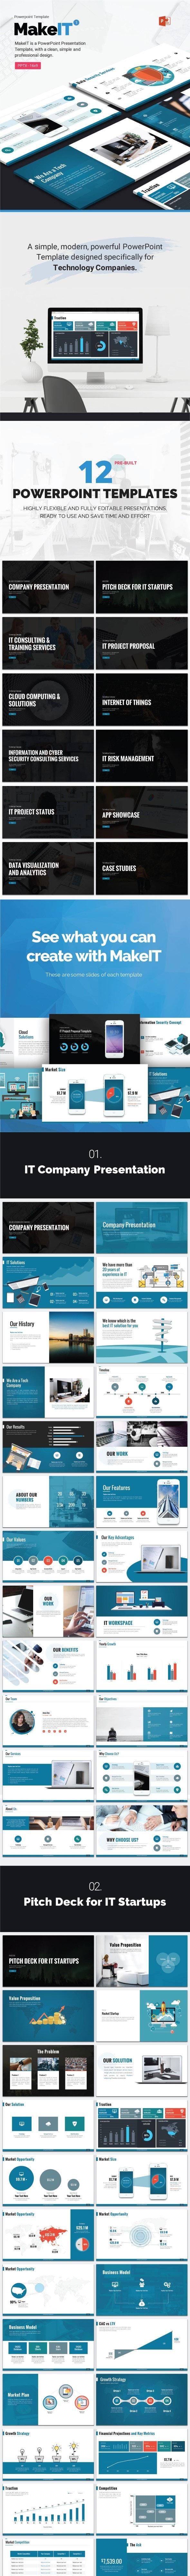 MakeIT-PowerPoint Template - Pitch Deck PowerPoint Templates